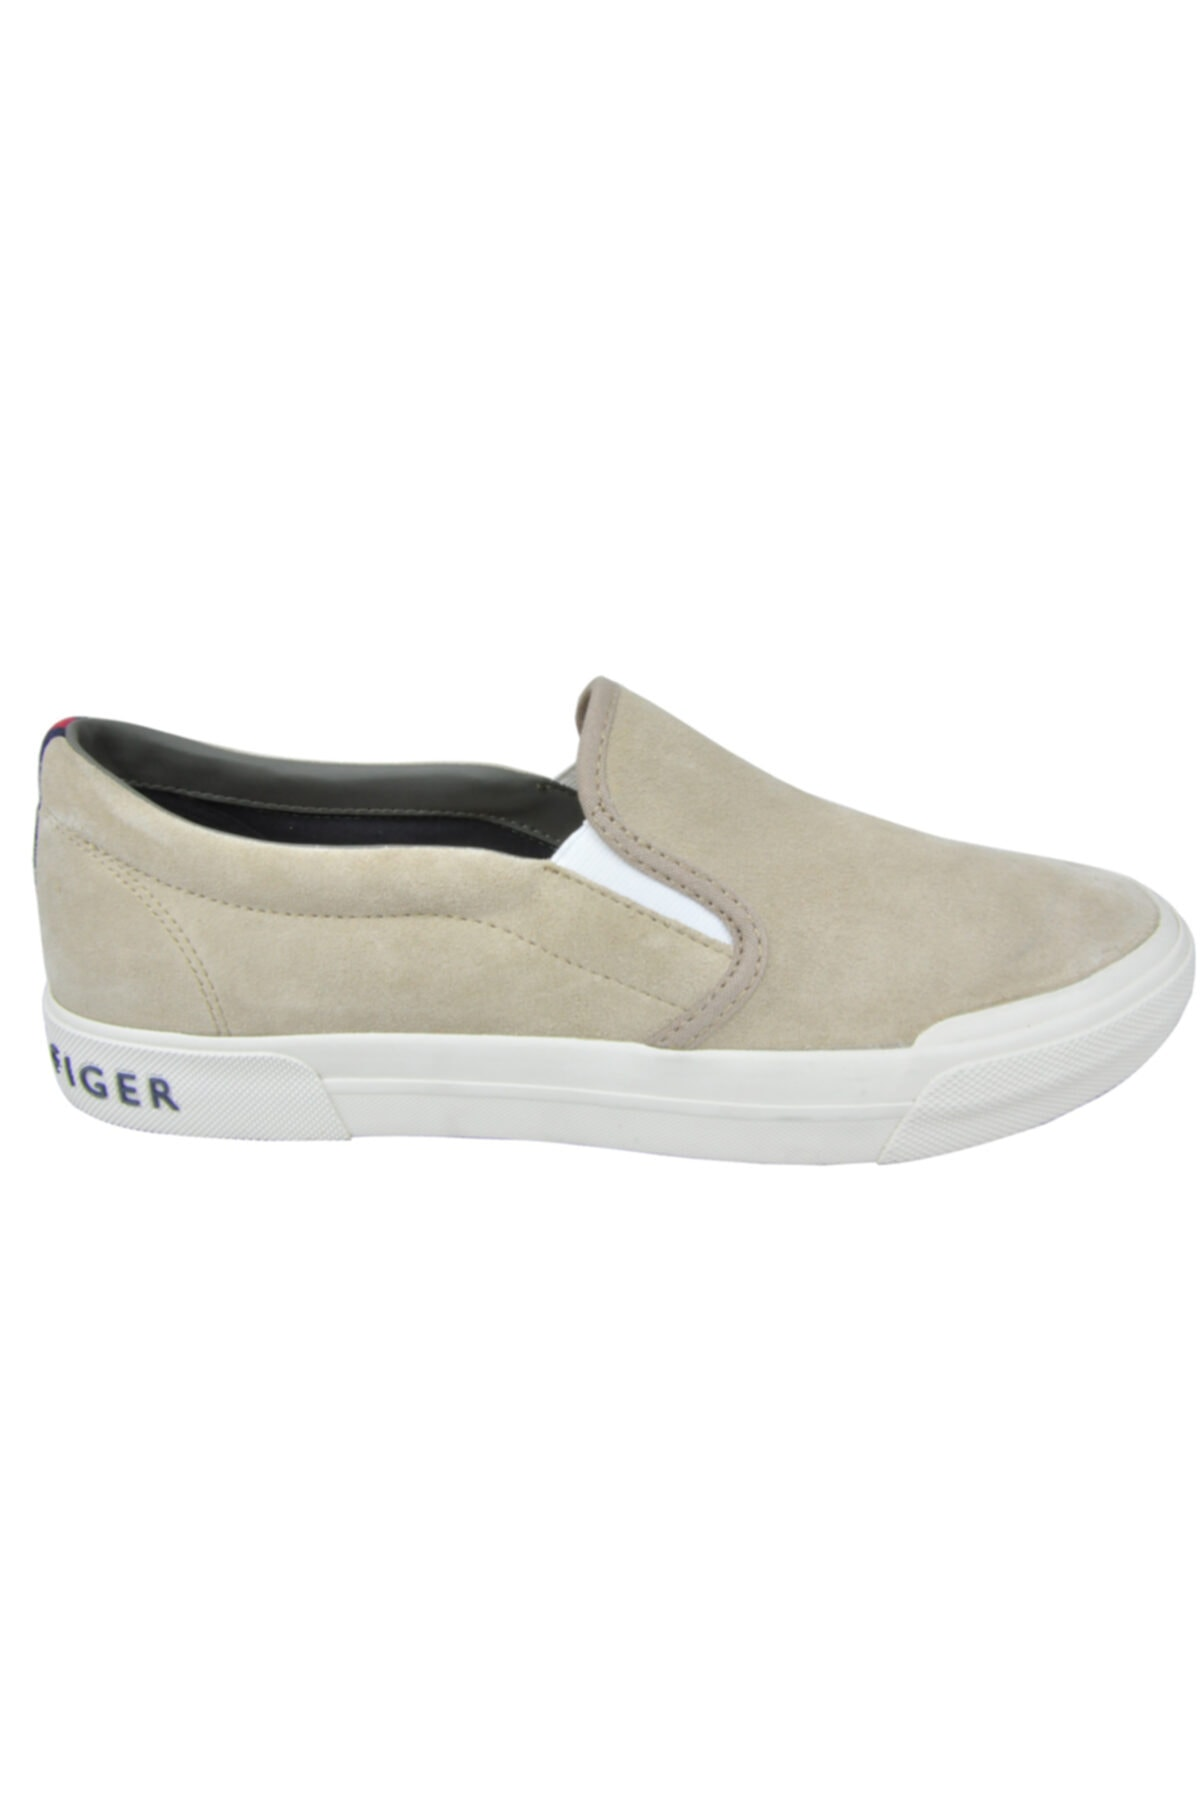 Tommy Hilfiger Tommy Hılfıger Erkek Sneakers Ayakkabı U002945 1